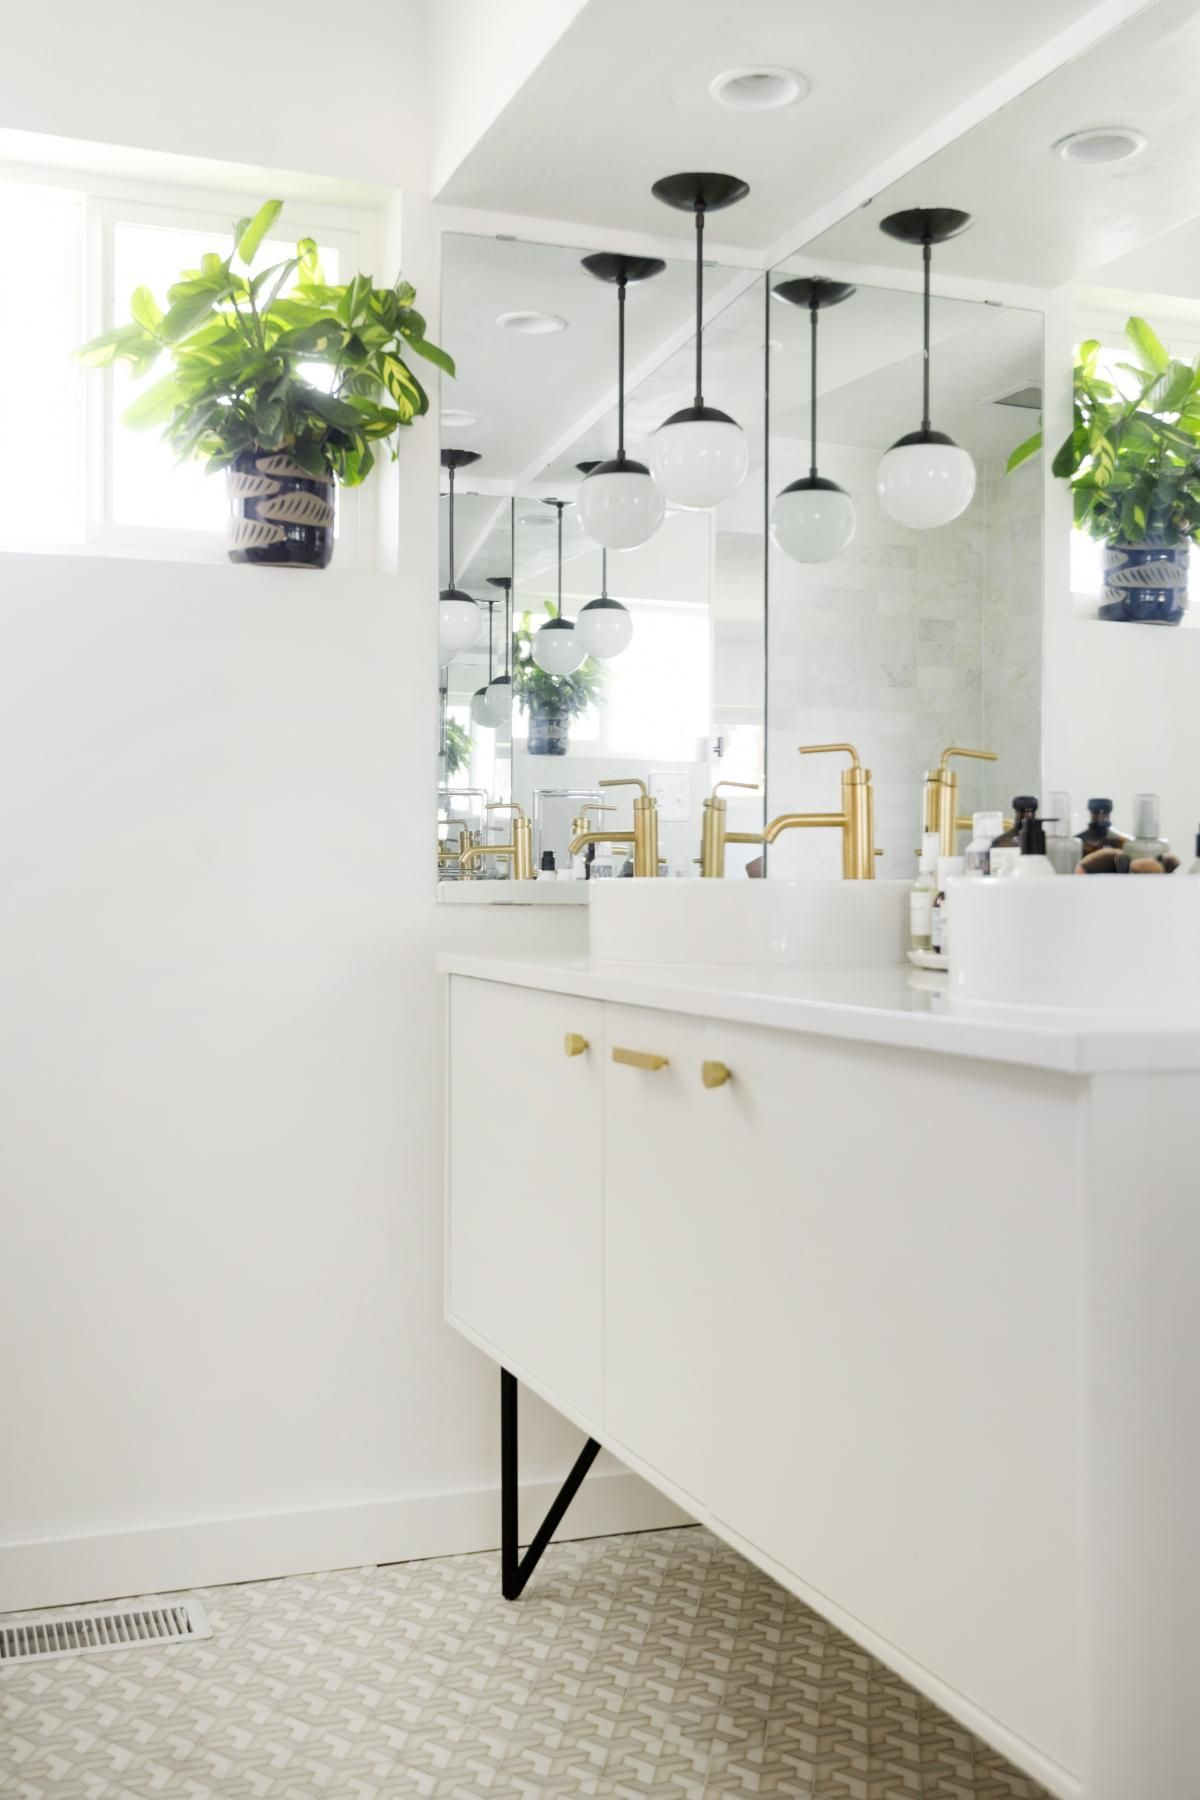 Jute vanity // Grove's Bathroom Renovation via Simply